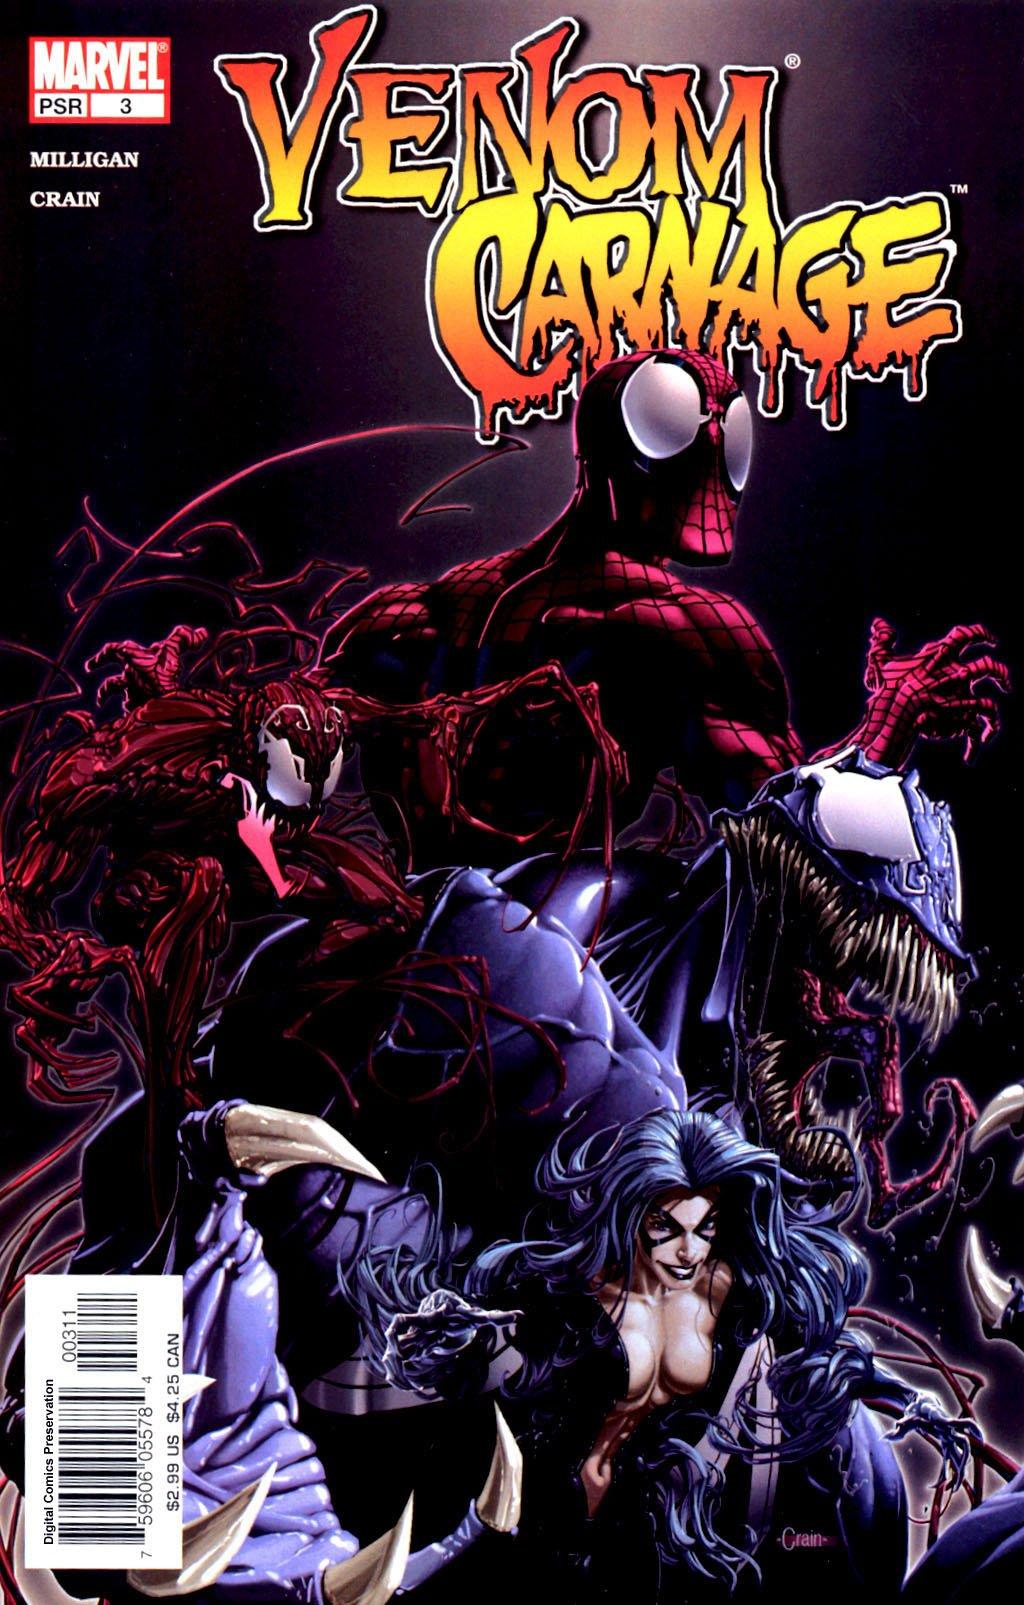 Venom Vs  Carnage, #3 (Comic Book): Peter Milligan: Amazon